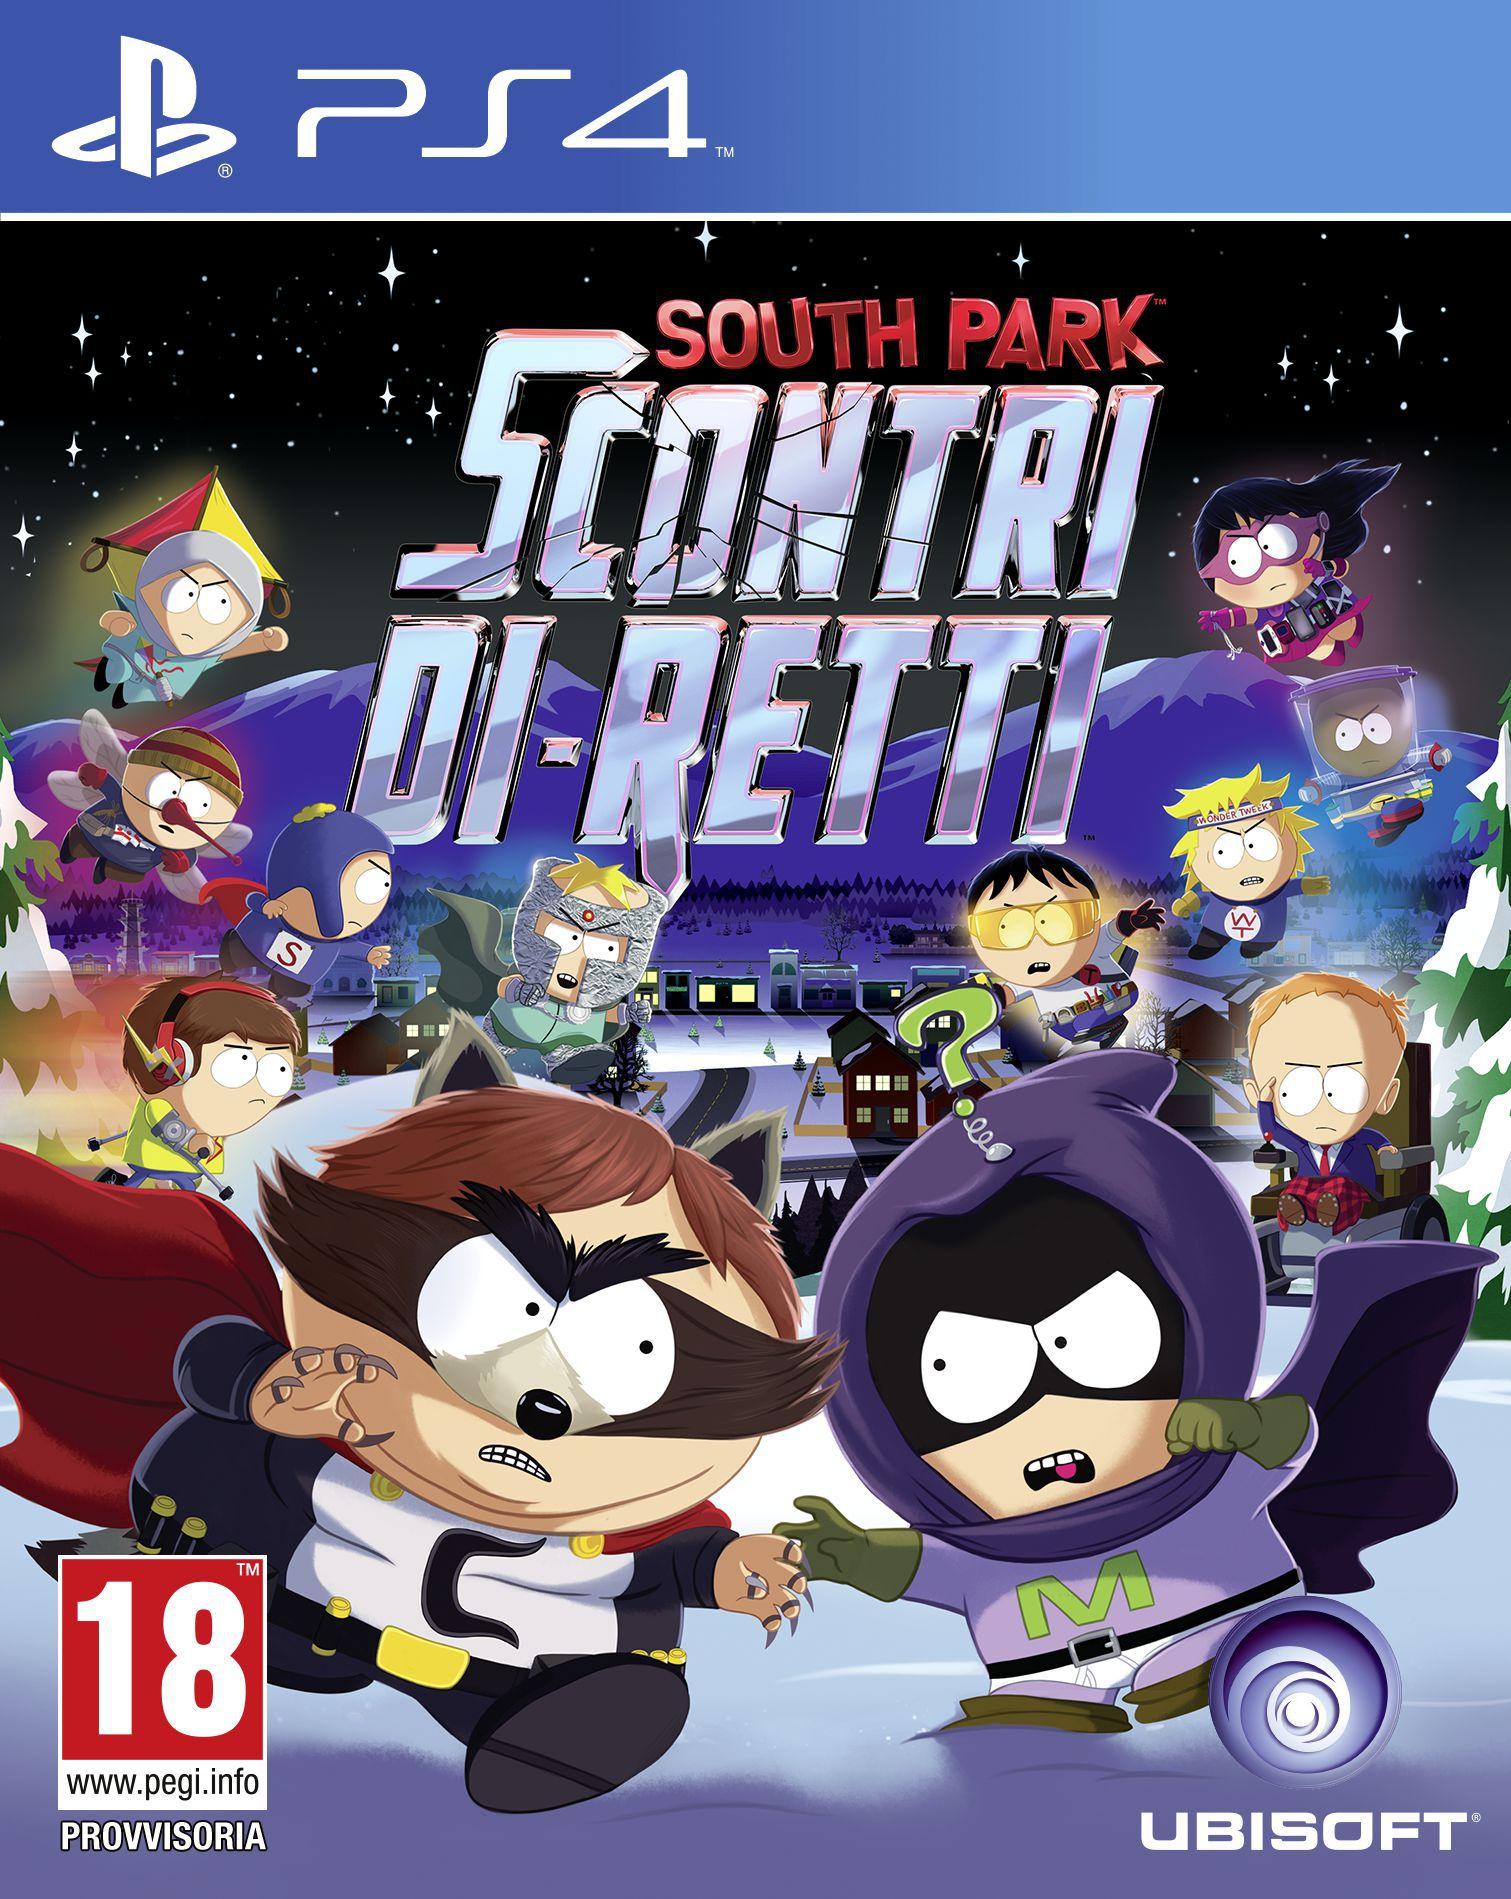 South Park: Scontri Di-Retti - South Park Studios